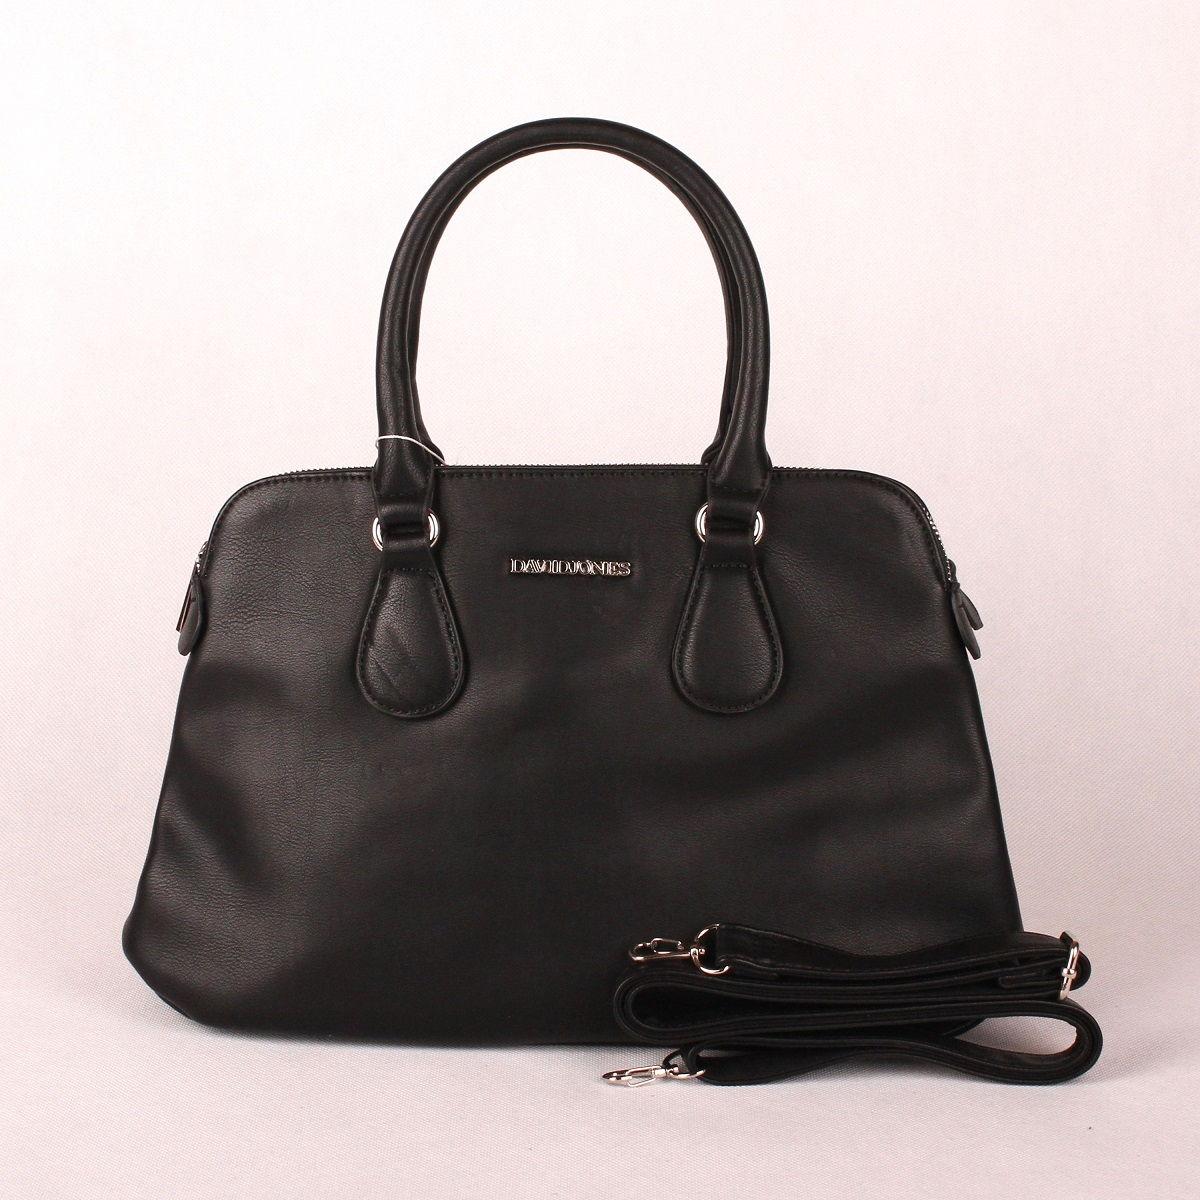 4d9c896d63 Černá kabelka do ruky David Jones CM3001